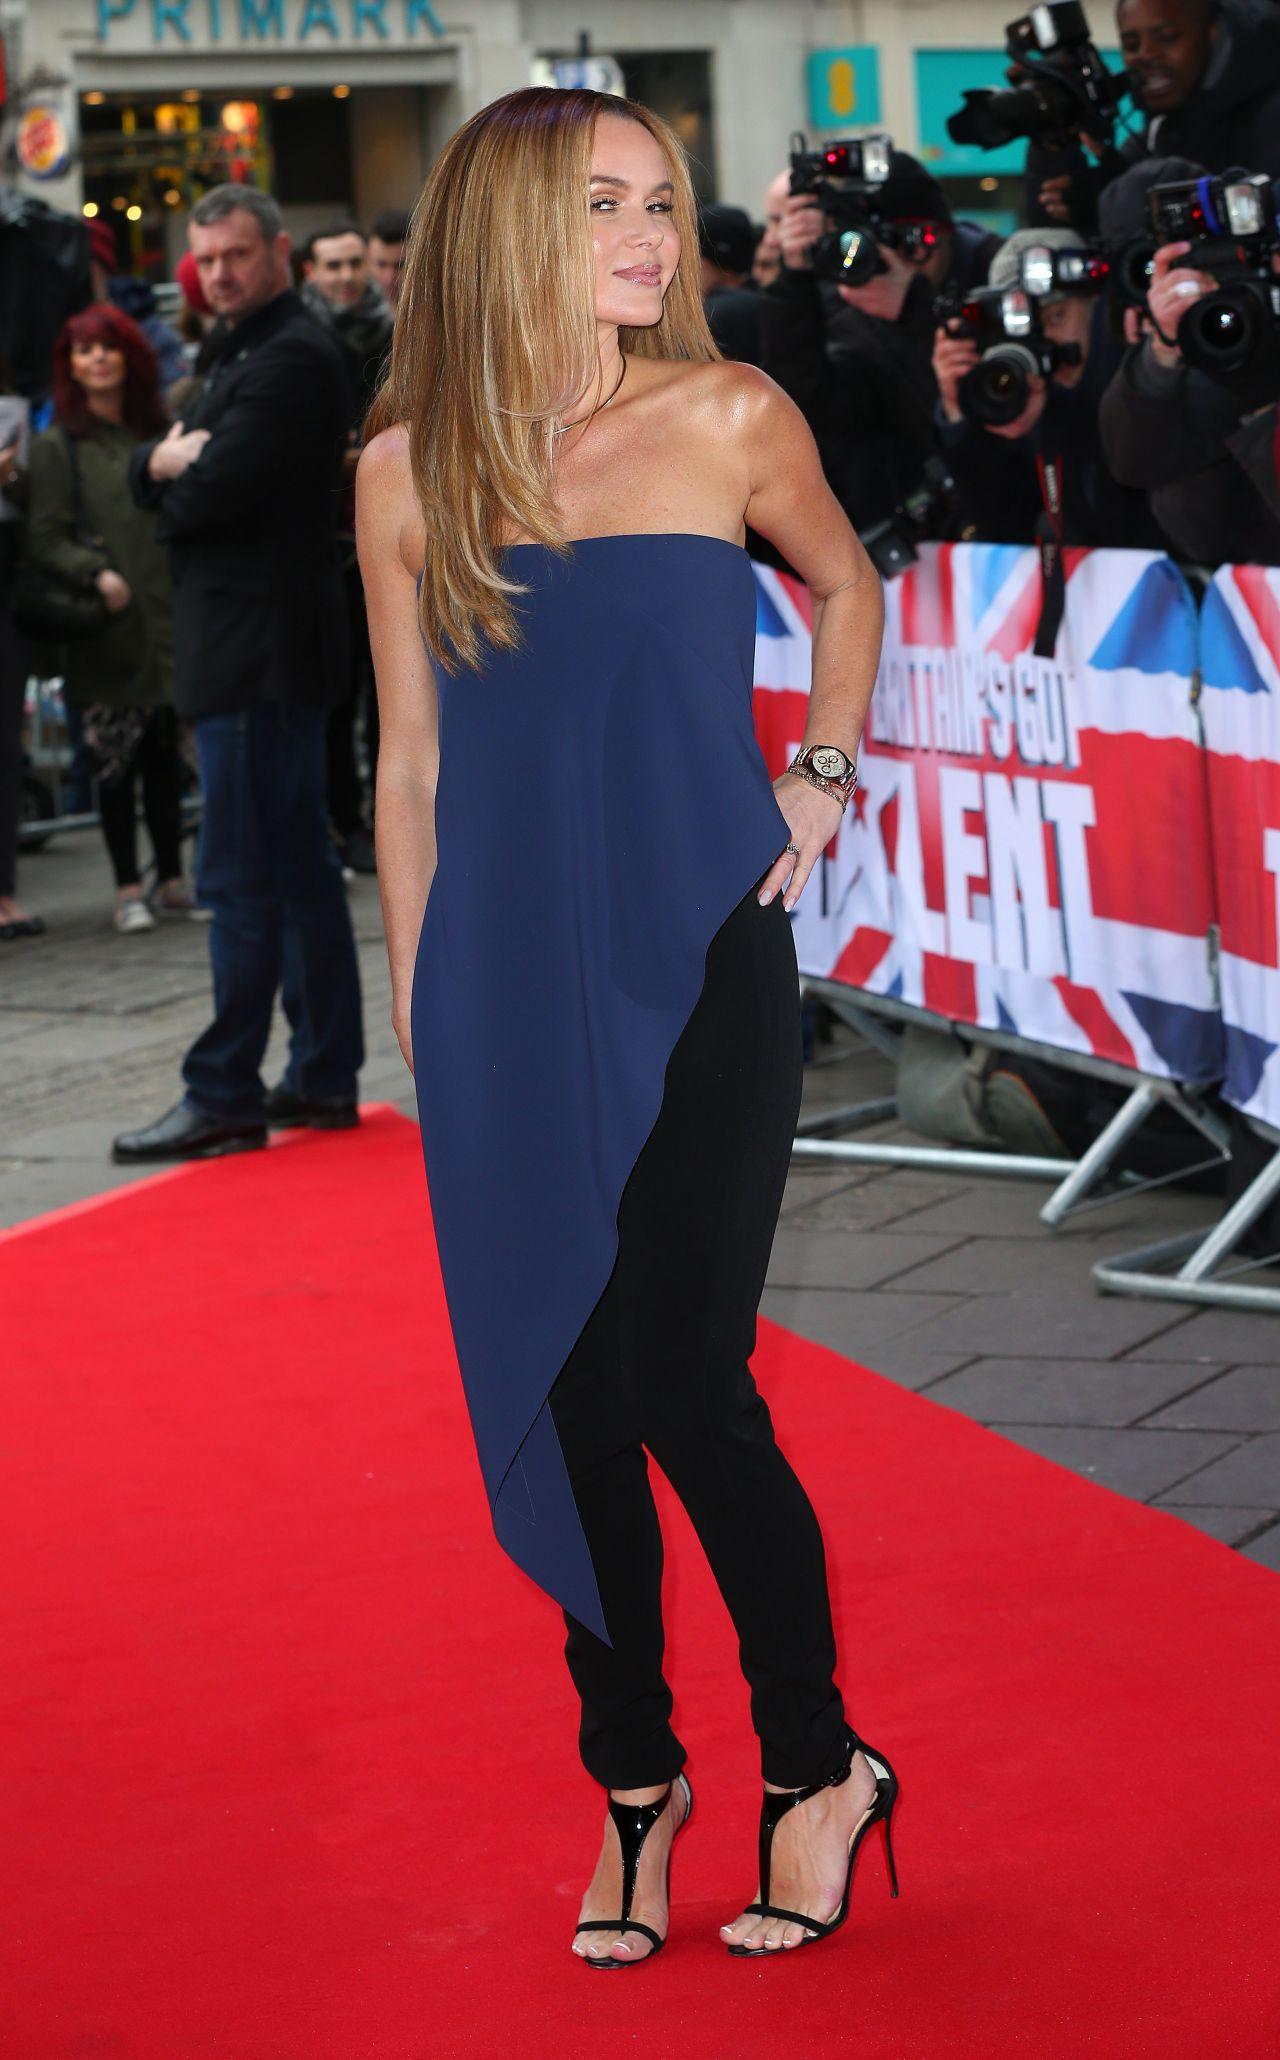 Amanda holden britains got talent london - 2019 year